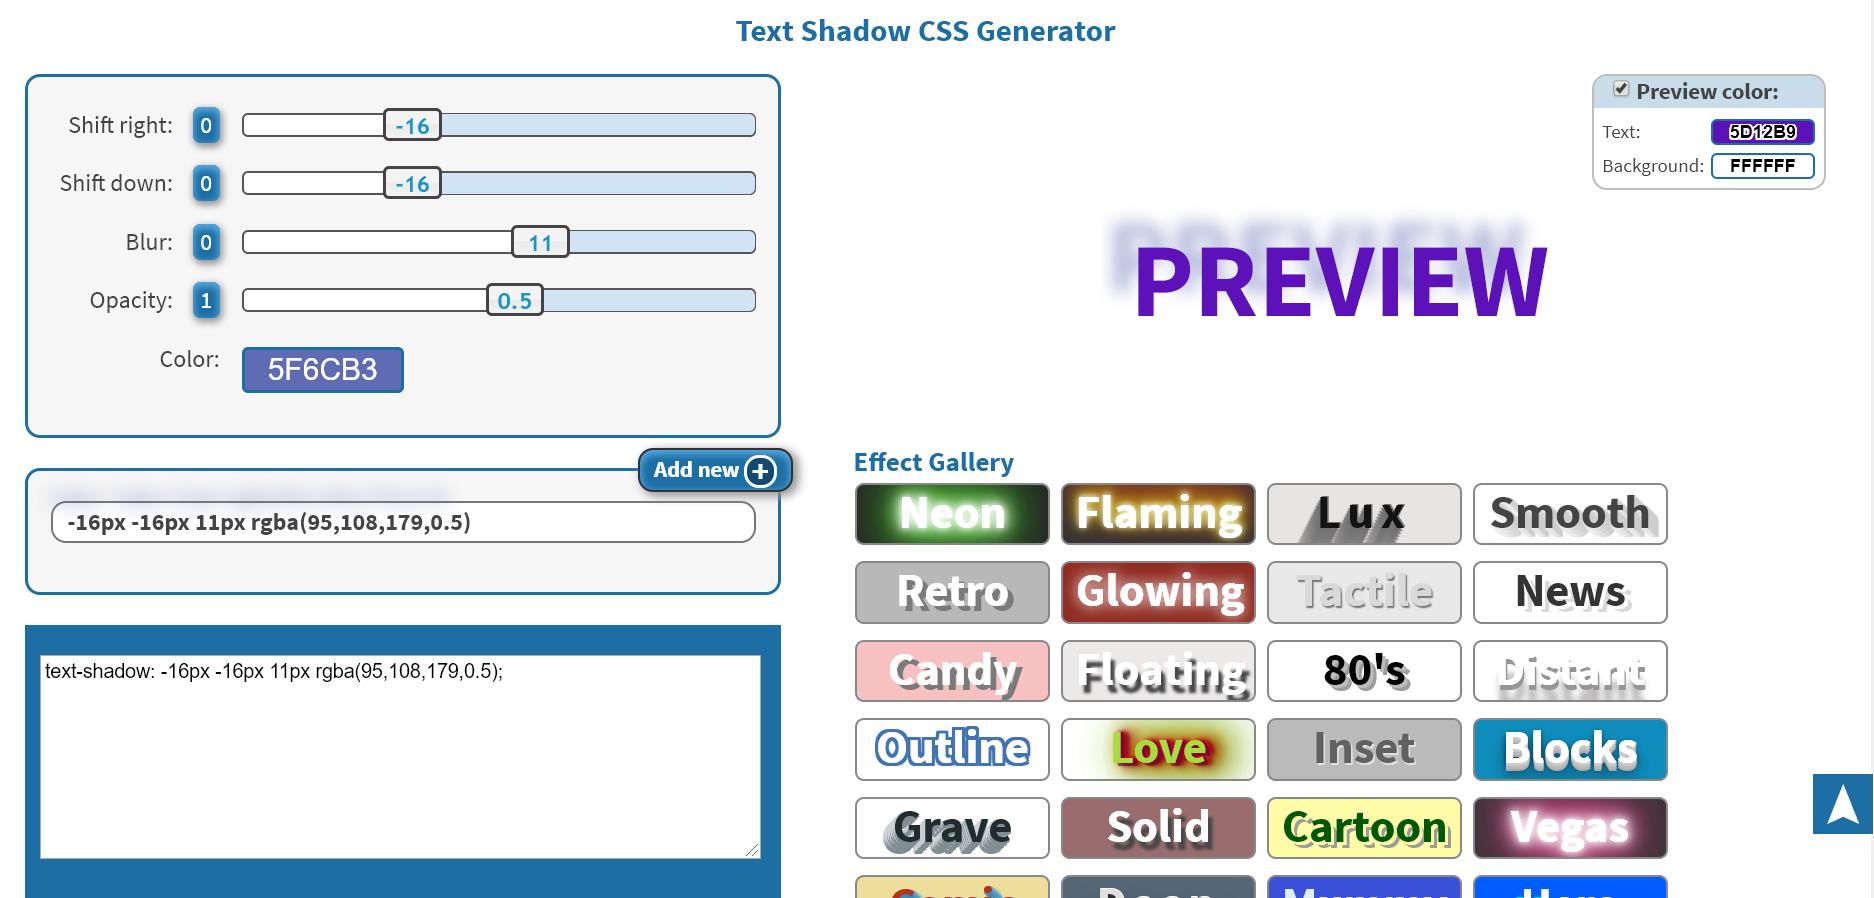 Screenshot of a text shadow CSS generator